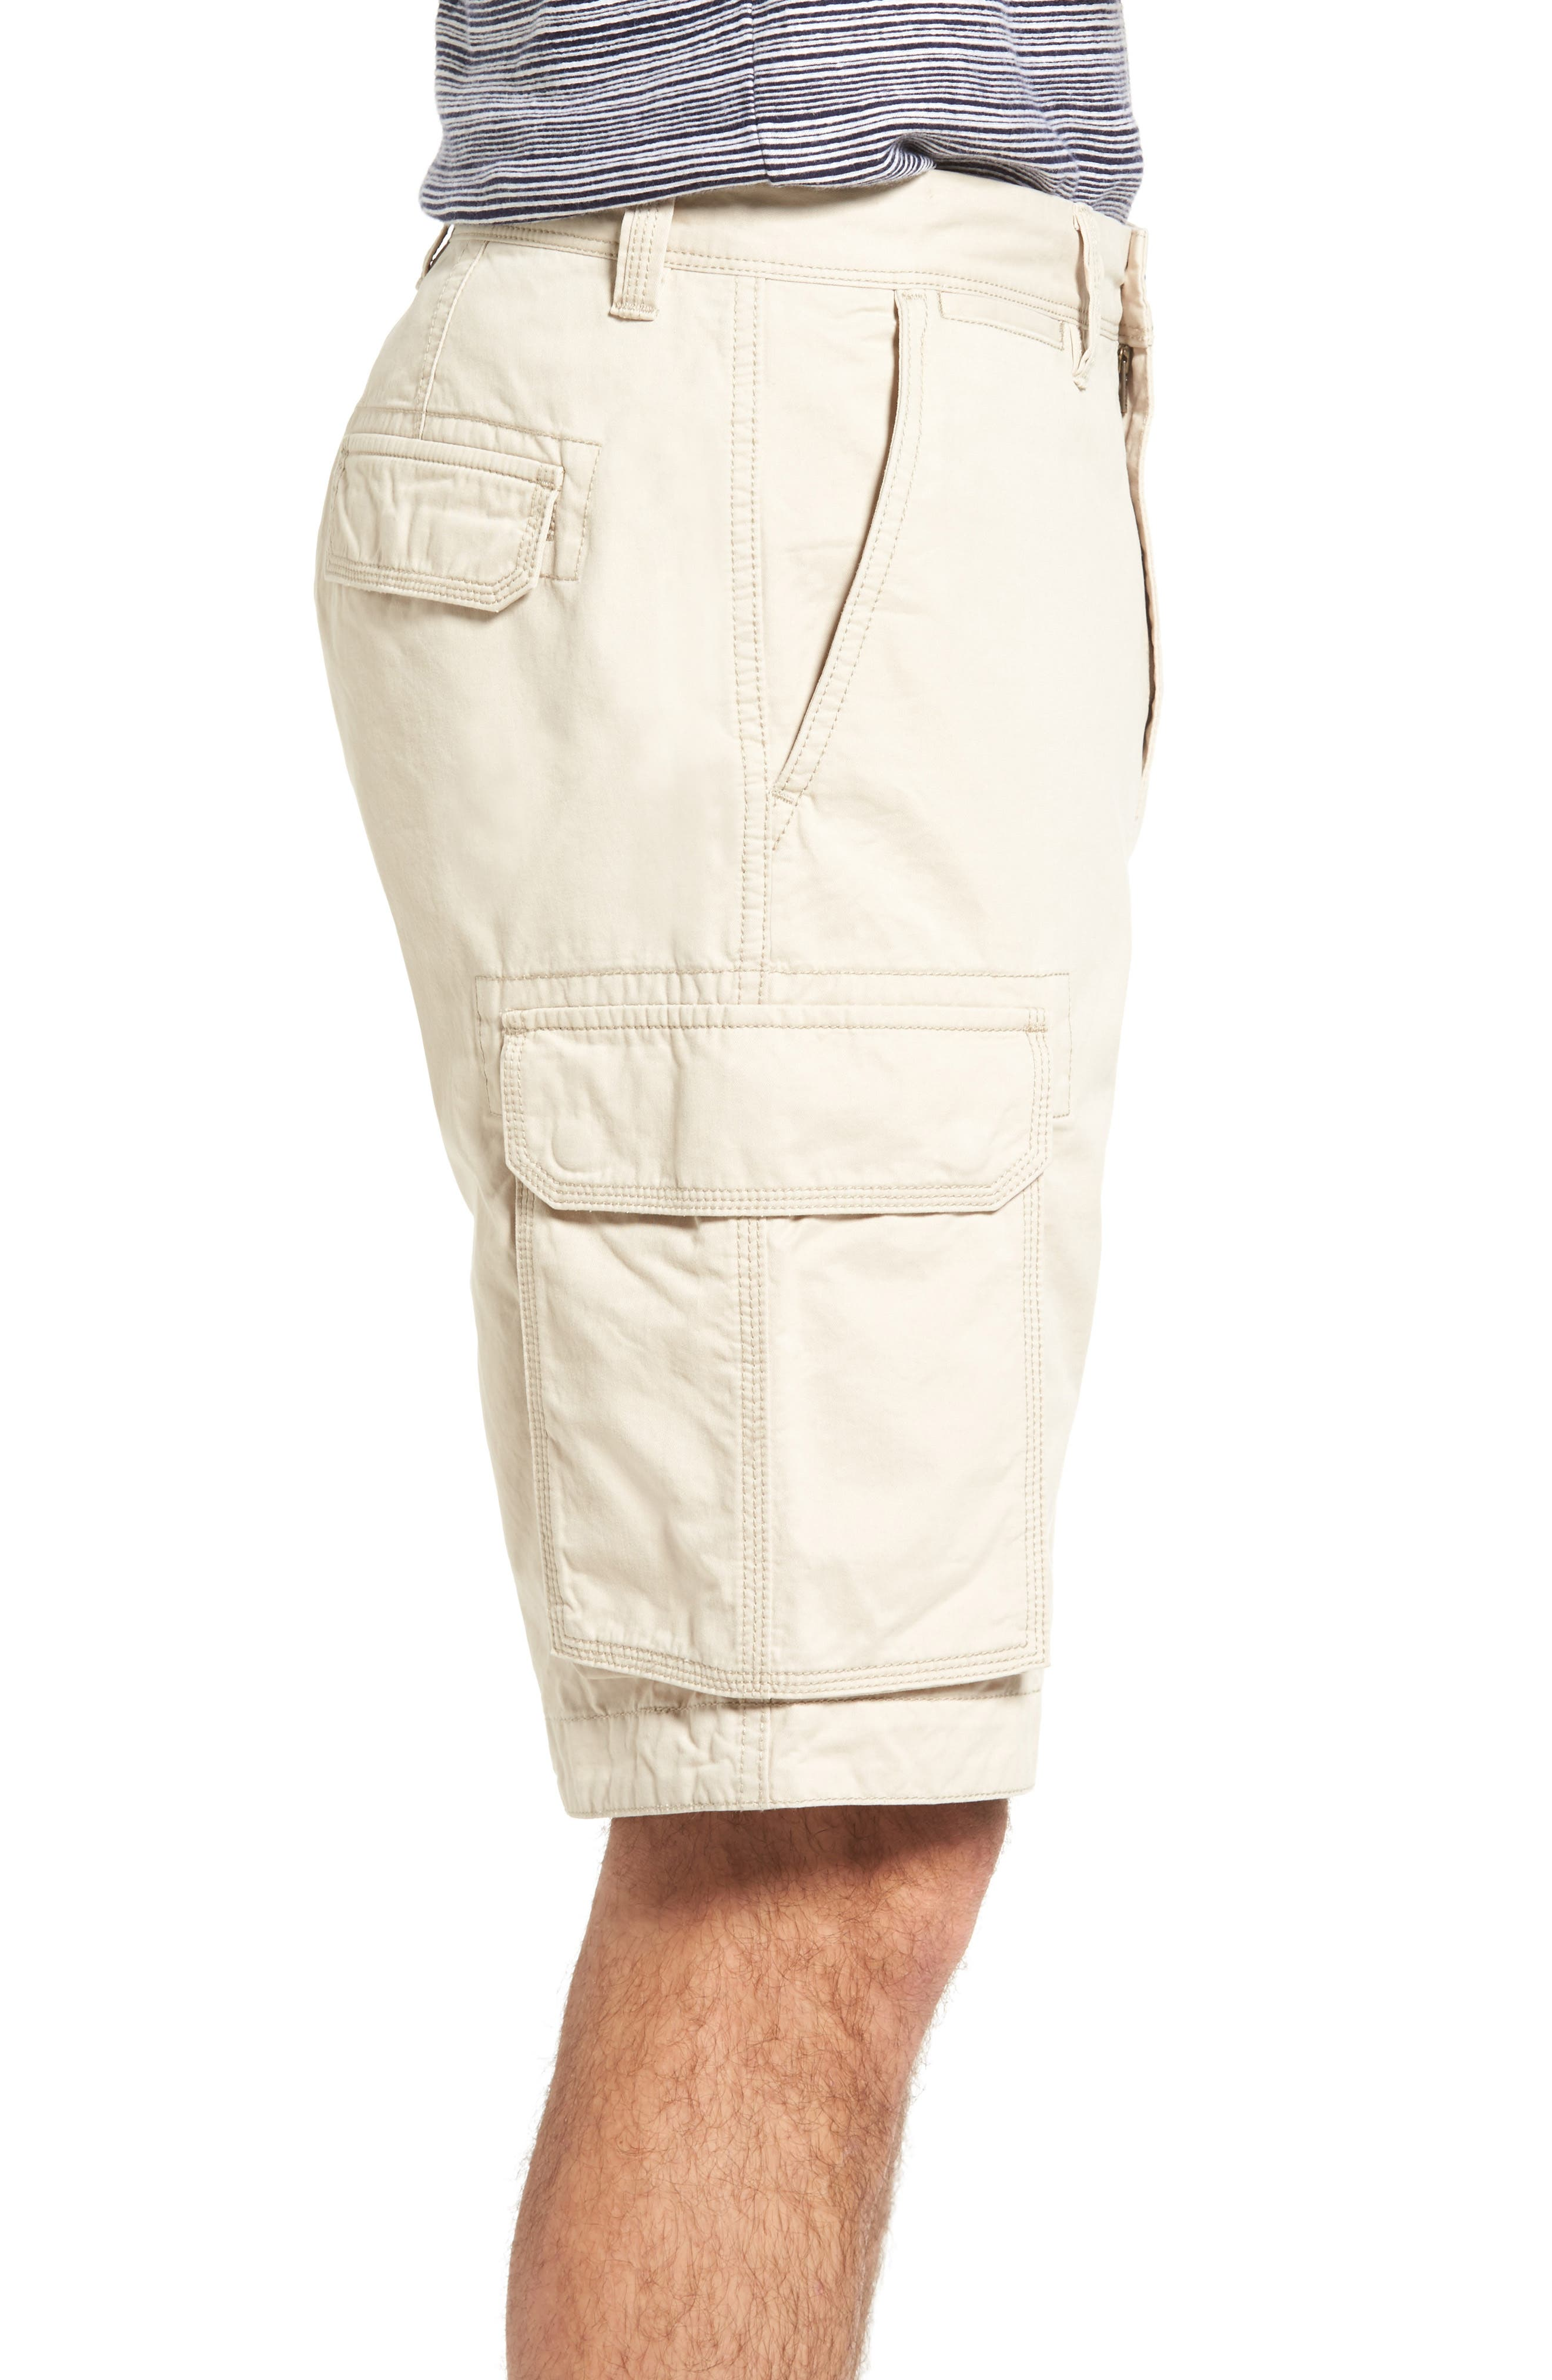 Homewood Utility Shorts,                             Alternate thumbnail 3, color,                             252